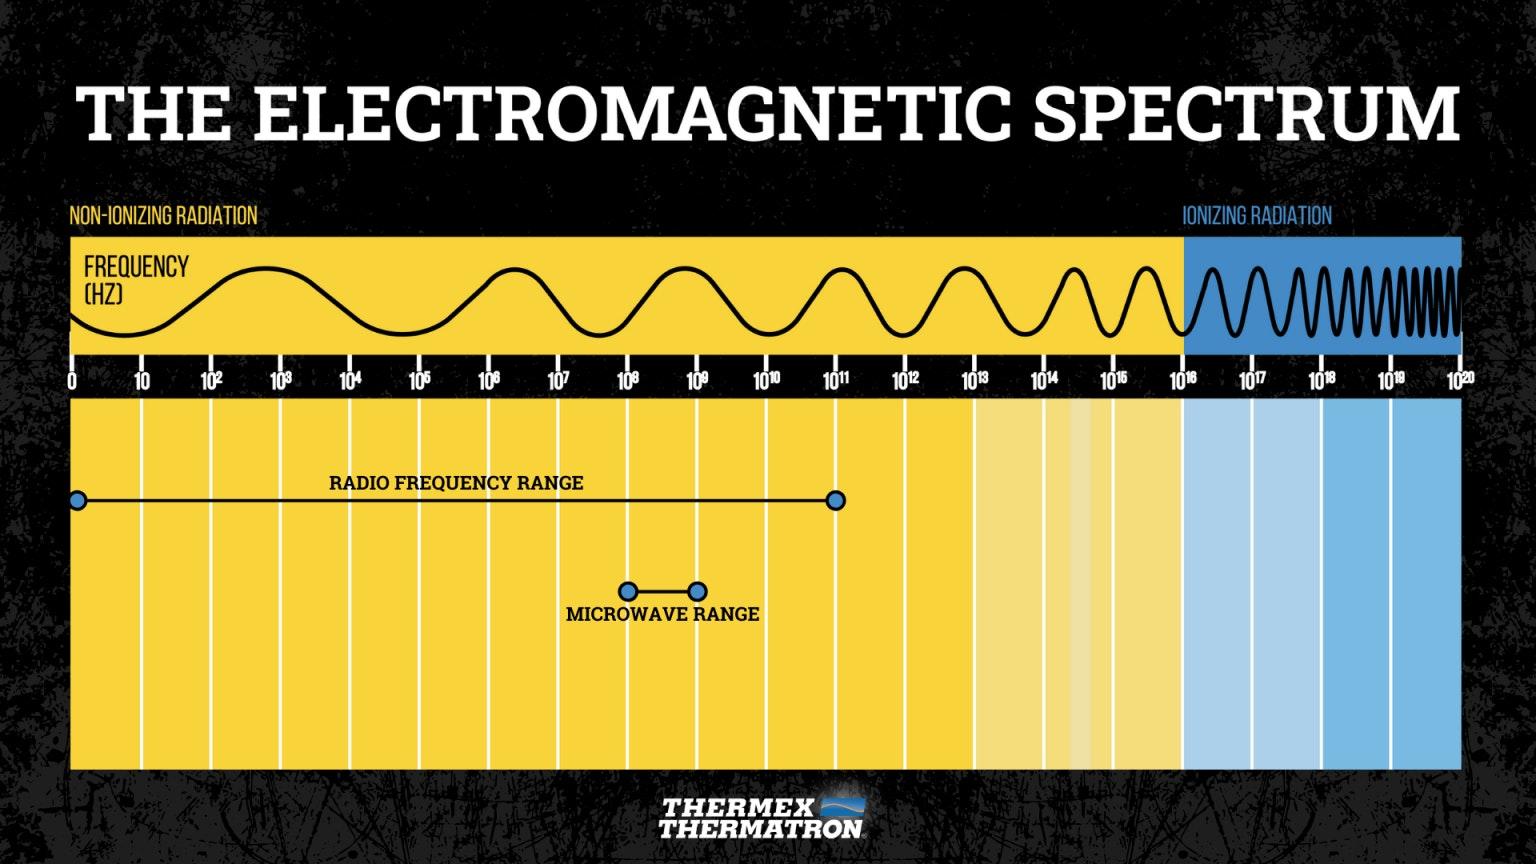 Thermex Thermatron Emspectrum Rf Mw Illustration 1536x864